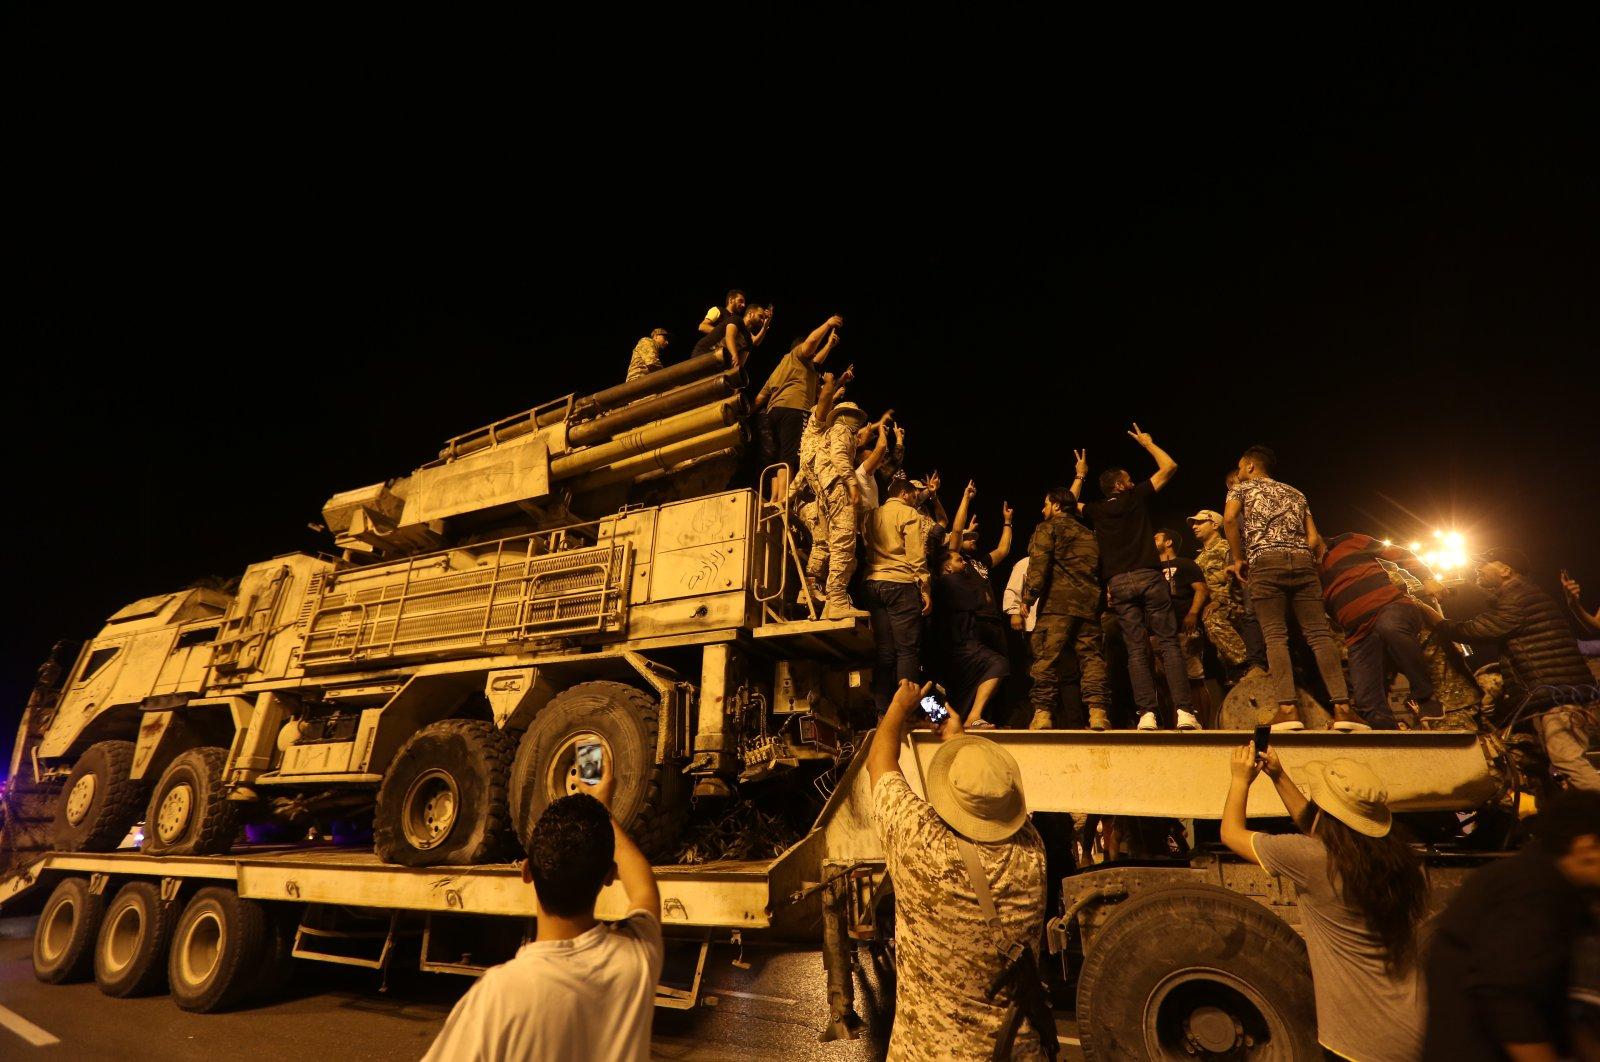 Members of the Libyan Army display Russian-made air defense systems confiscated at the Khalifa Haftar-held al-Watiya air base on the streets of Tripoli, Libya, May 20, 2020. (AA Photo)